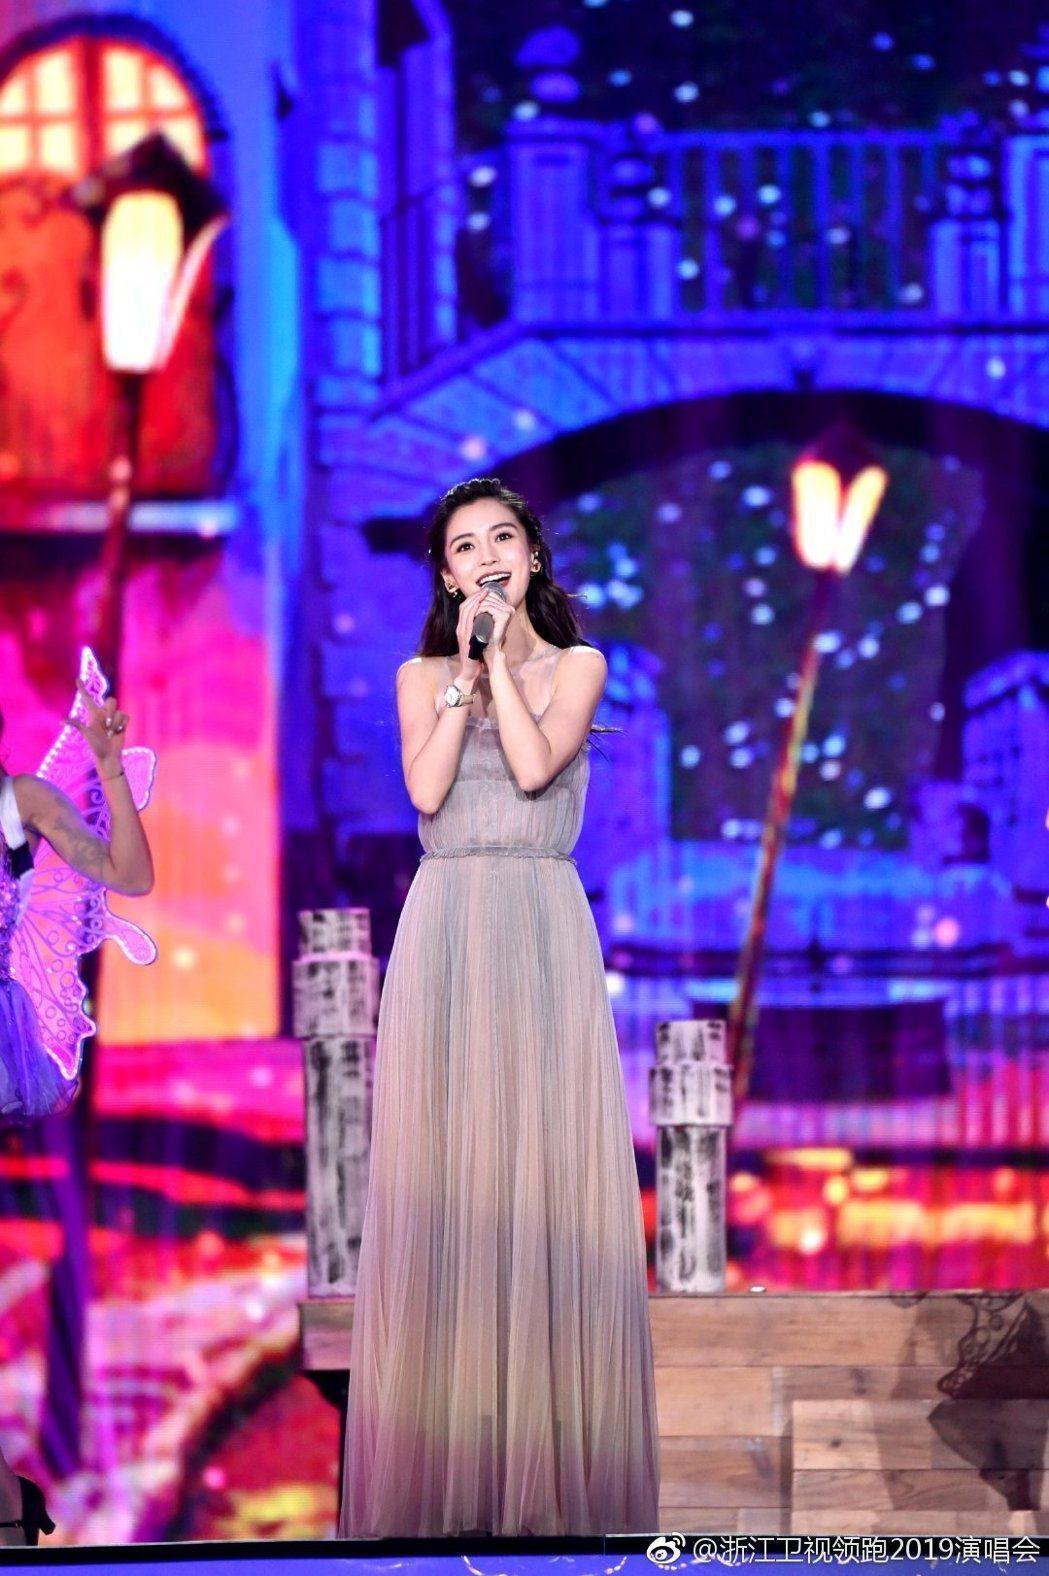 Angelababy在浙江衛視的跨年晚會上開唱,被揶揄「全程走音」。圖/摘自微博